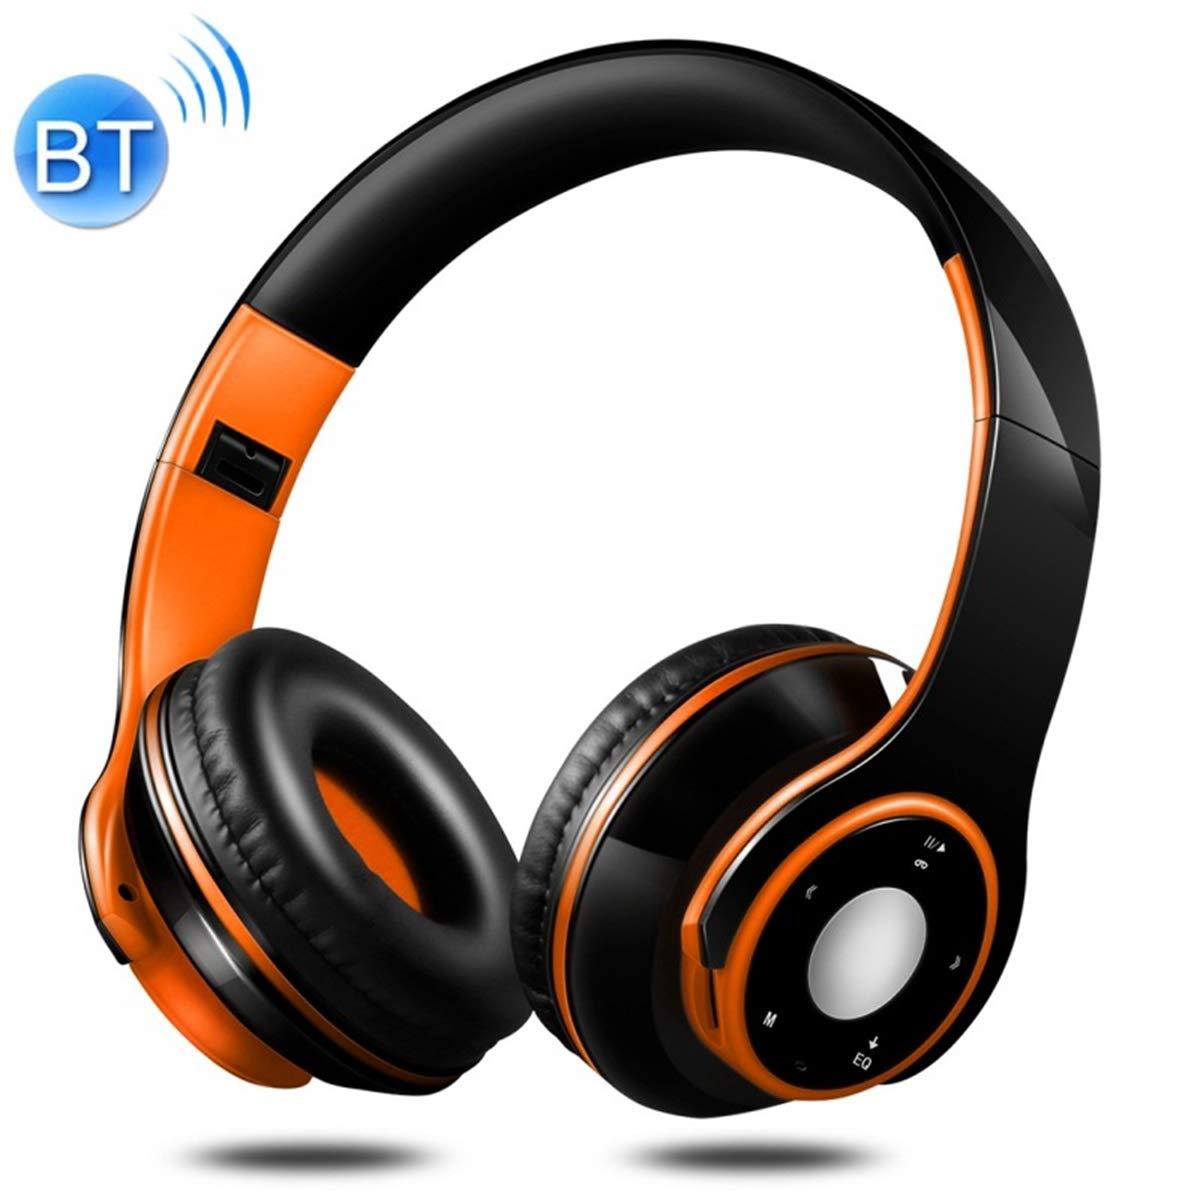 POPUPE SG-8 Bluetooth 4.0 + EDR Headphones Wireless Over-Ear TF Card FM Radio Stereo Music Headset with Mic (Orange)